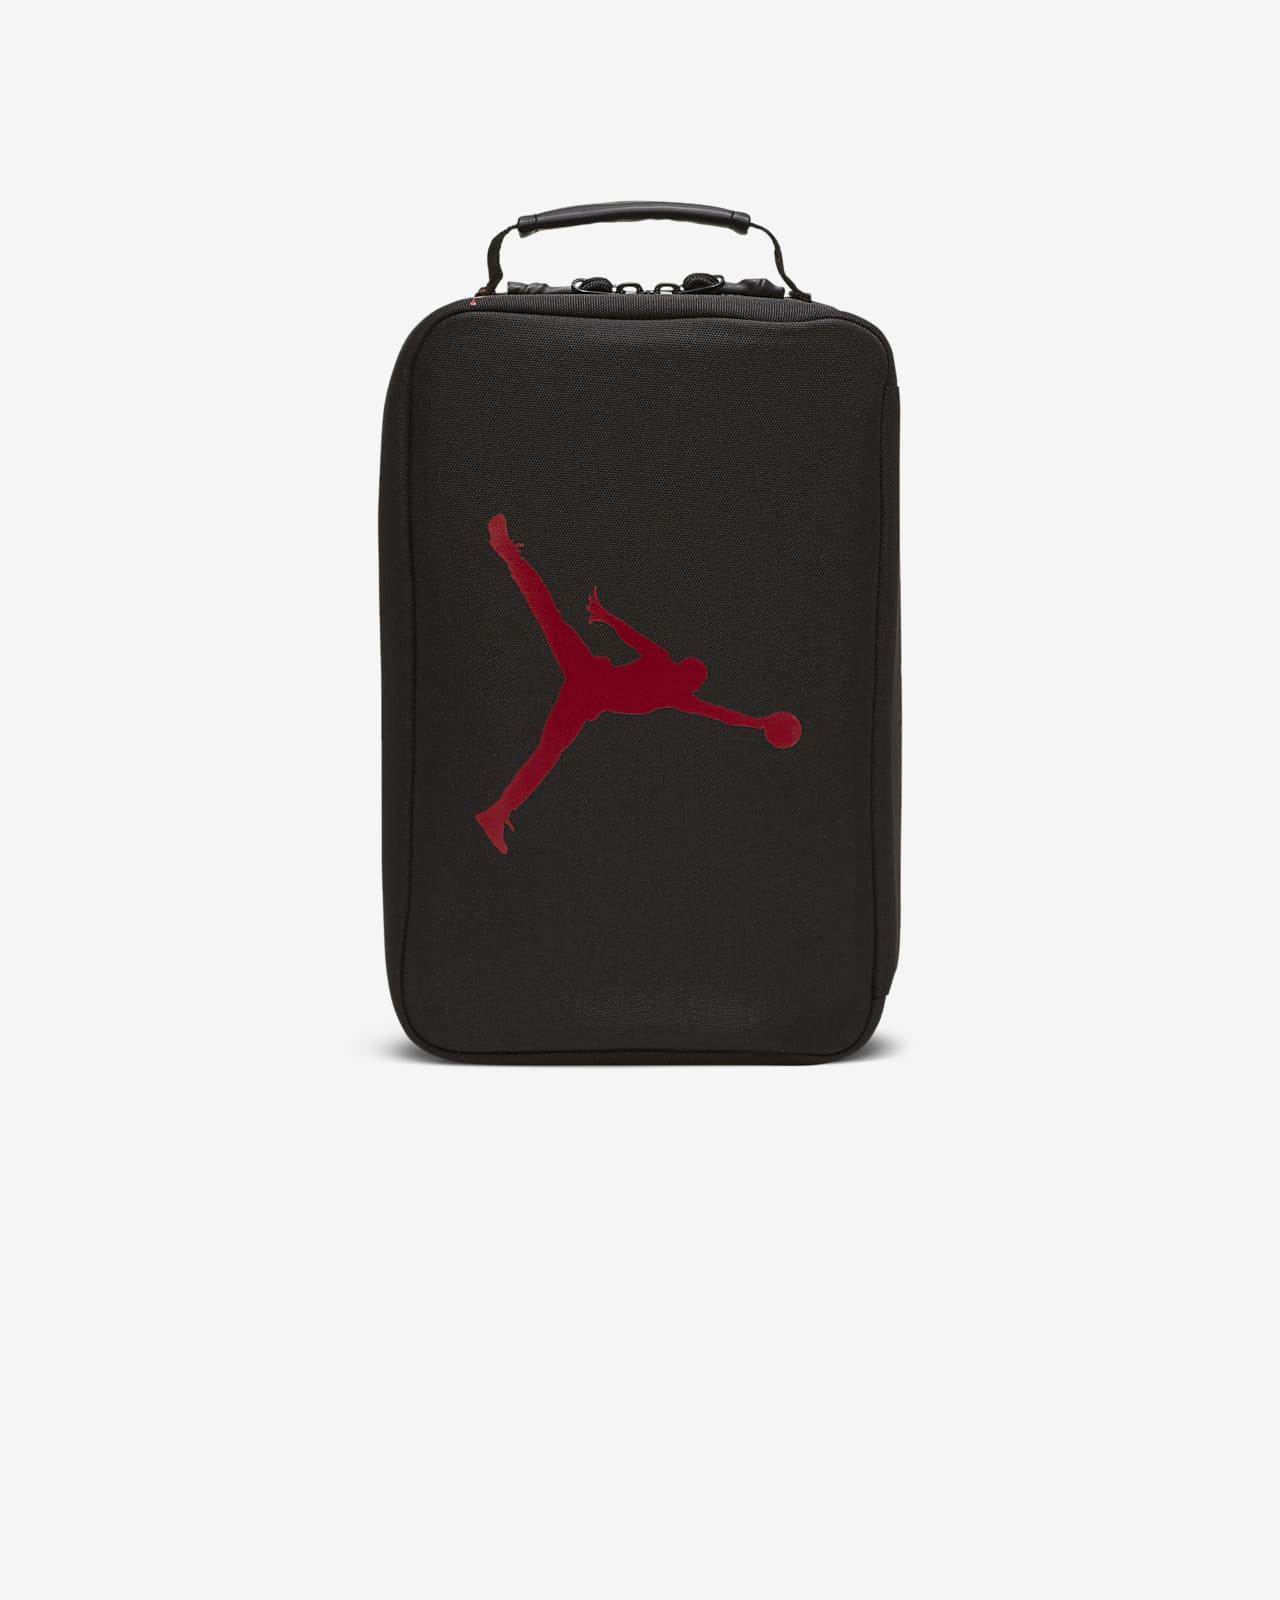 Saco Jordan Shoebox